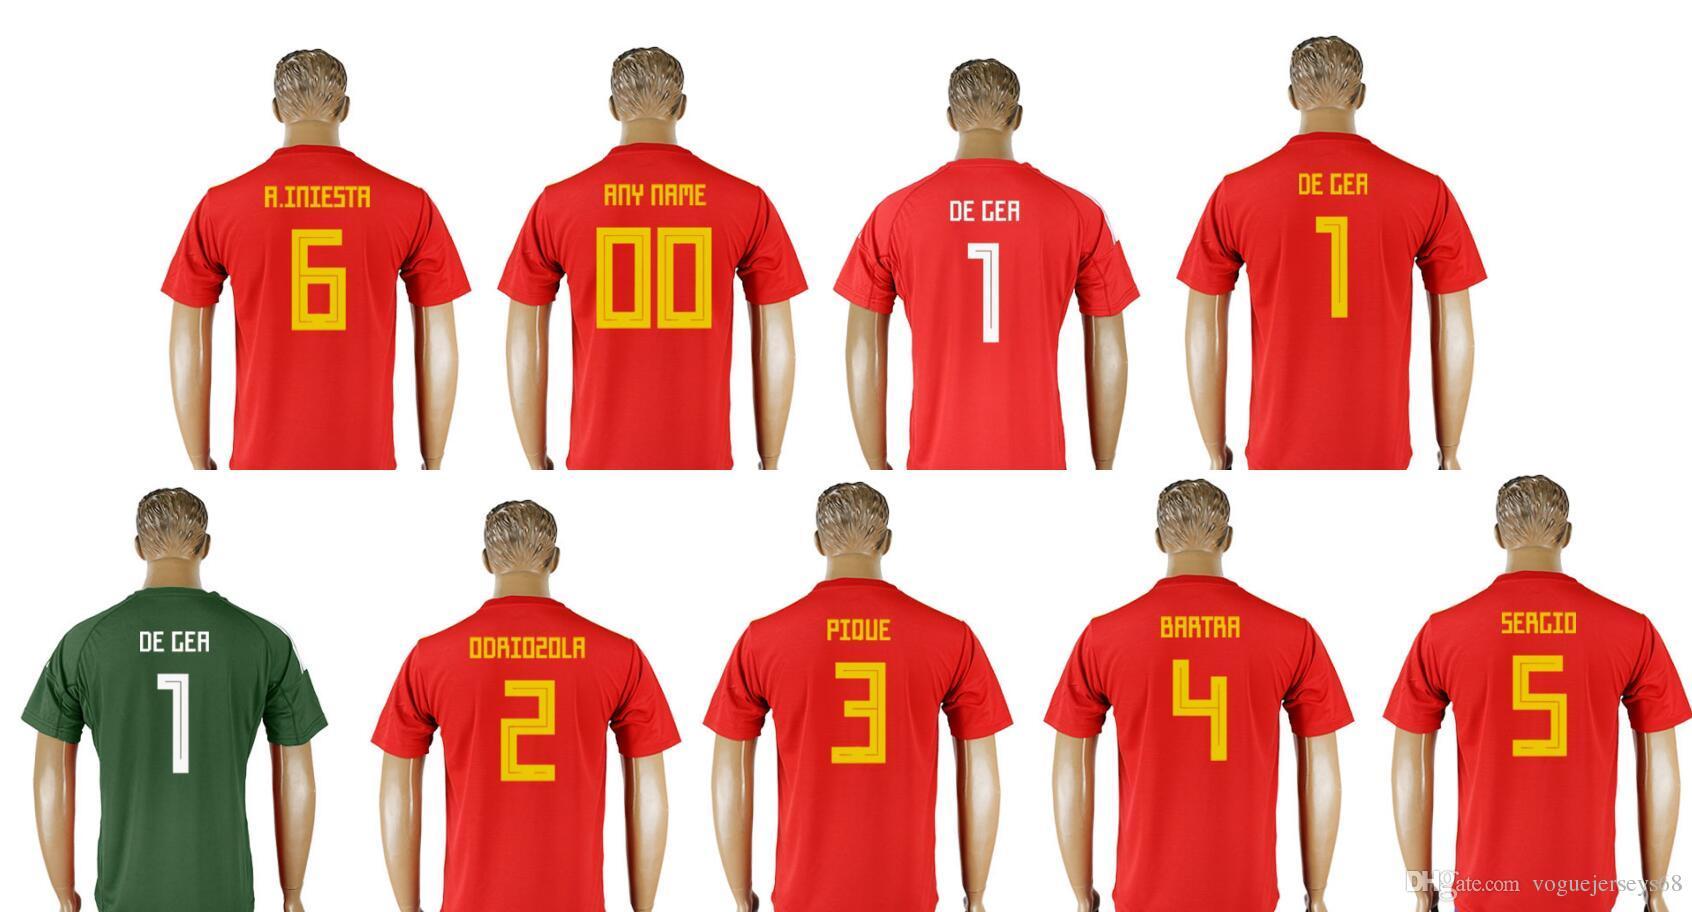 new product 03831 8fadf Spain New 2018 Mens #1 David de Gea #6 Andres Iniesta 5 Sergi Busquets 4  Marc Bartra Uniforms Shirts Sports Team Soccer Jerseys